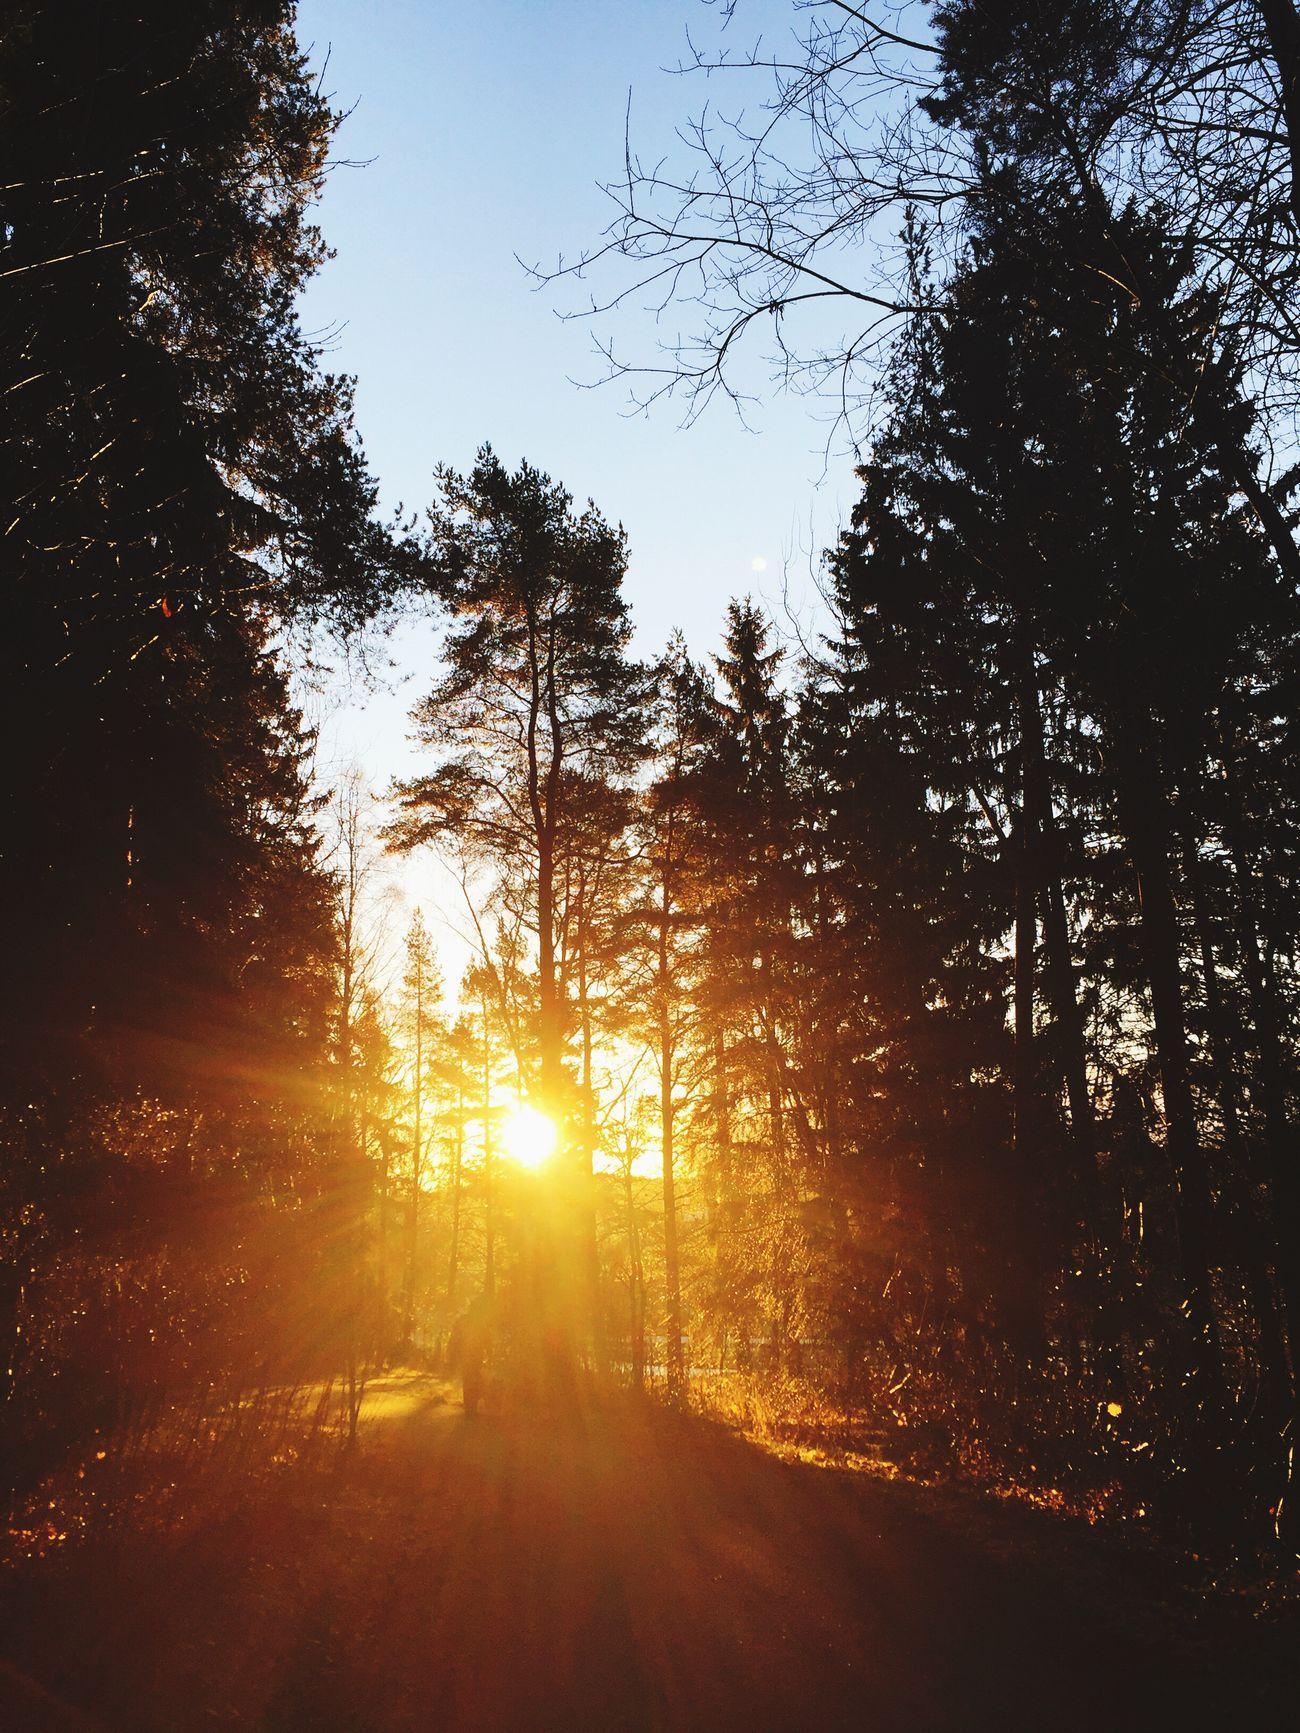 Morning Sunlight Dog Walker Morning Sun Nature Forest Light Turku In Finland Autumn